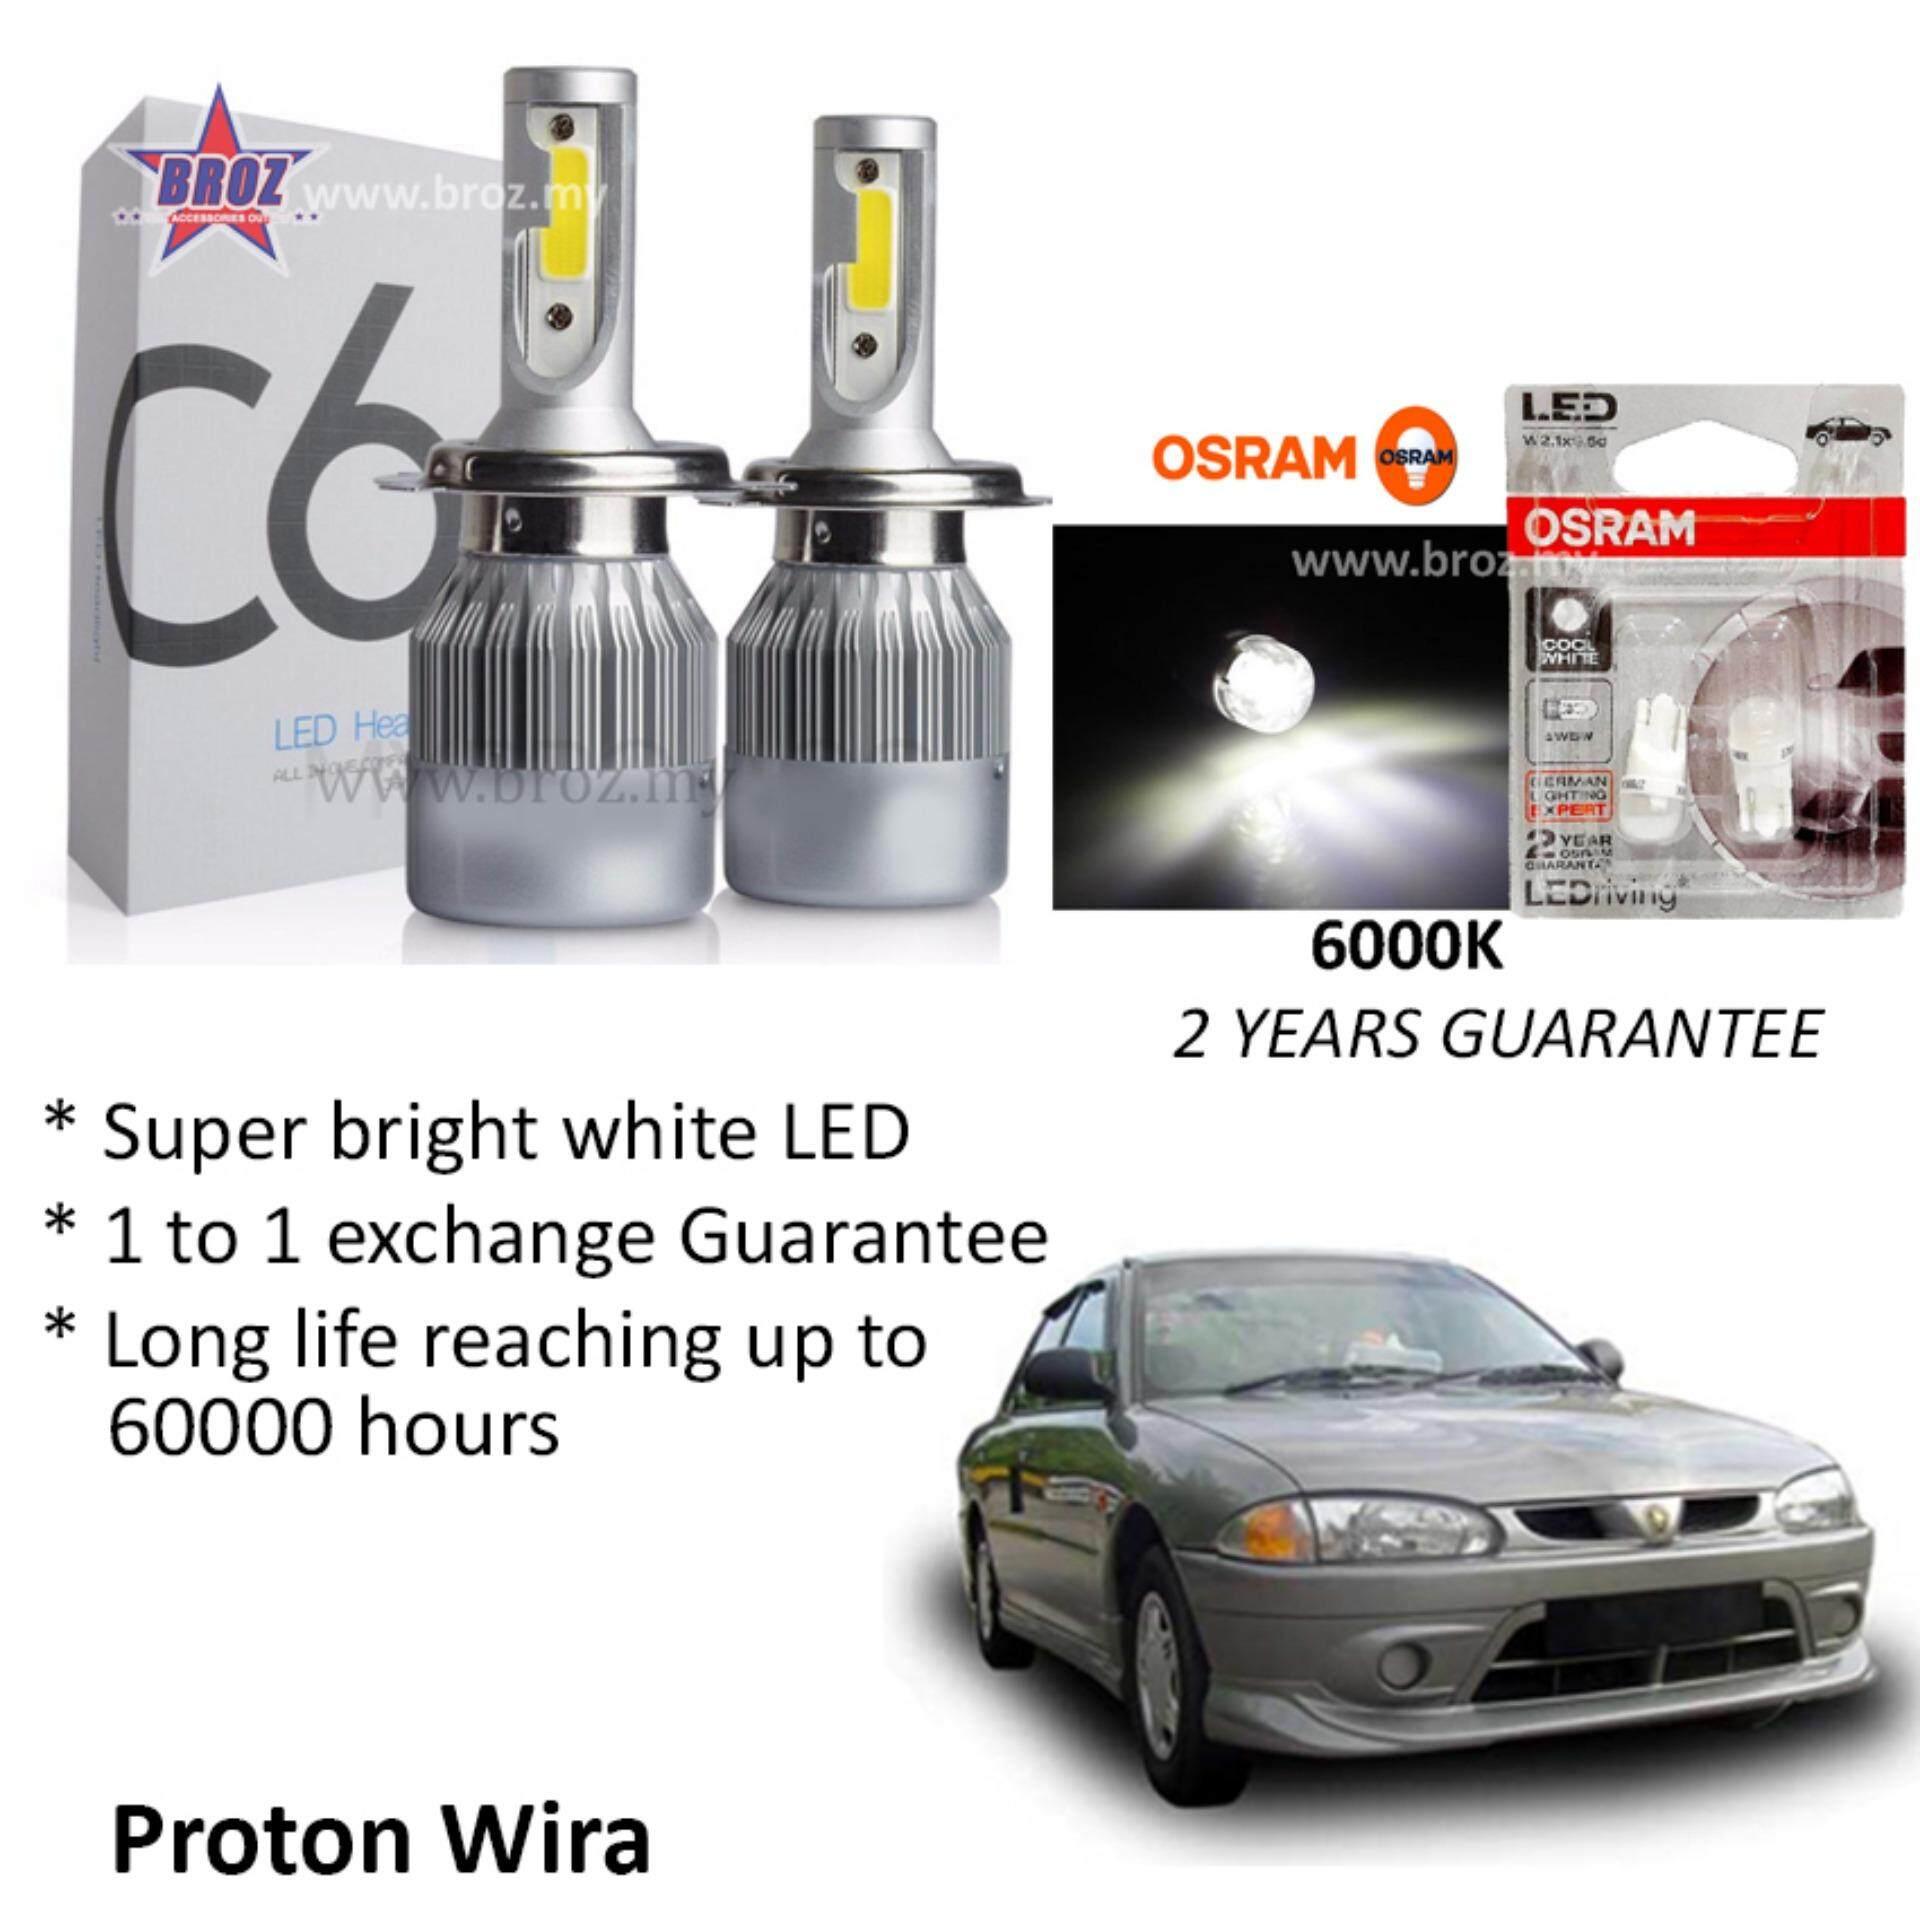 Proton Wira (Head Lamp) C6 LED Light Car Headlight Auto Head light Lamp 6500k White Light (Free Osram T10 LED)